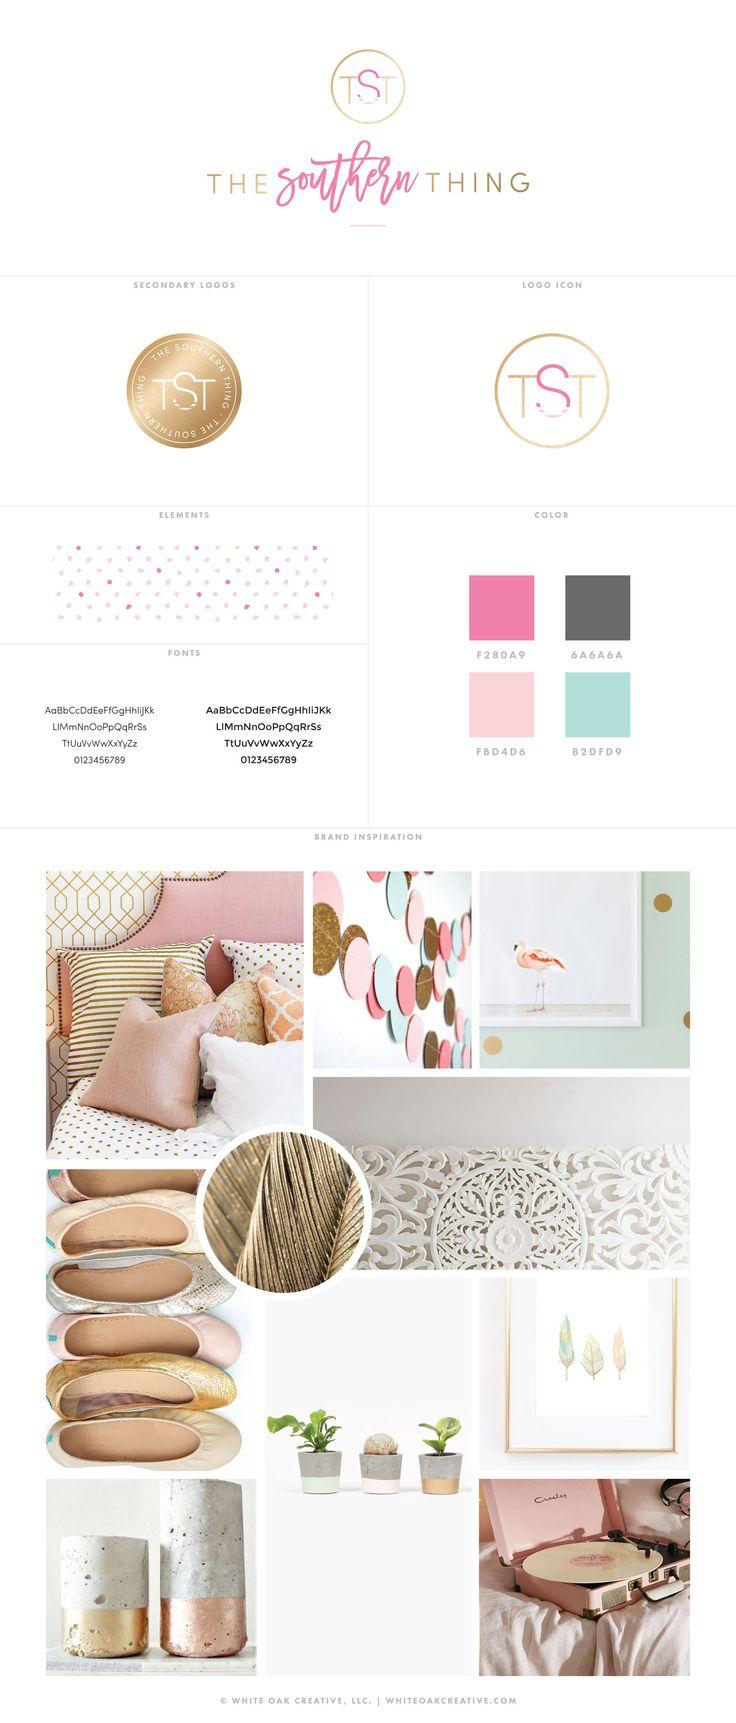 Design Blogs 174 Best Portfolio Images On Pinterest  Blog Designs Branding